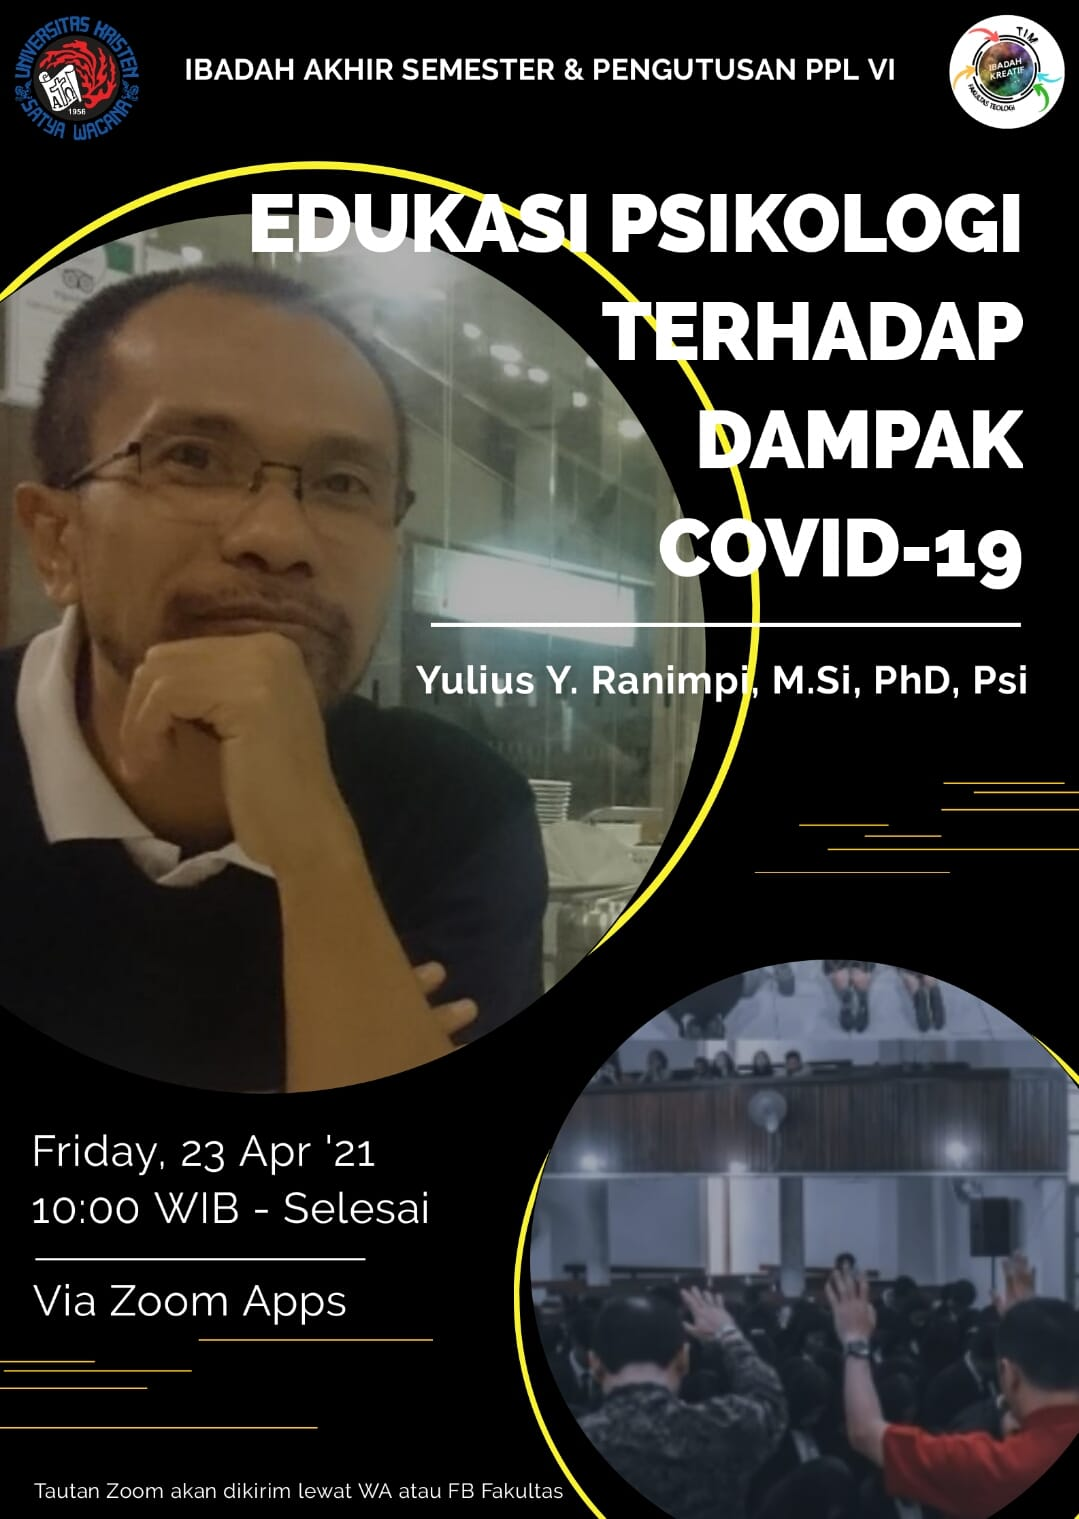 Ibadah Fakultas Teologi - 23 April 2021